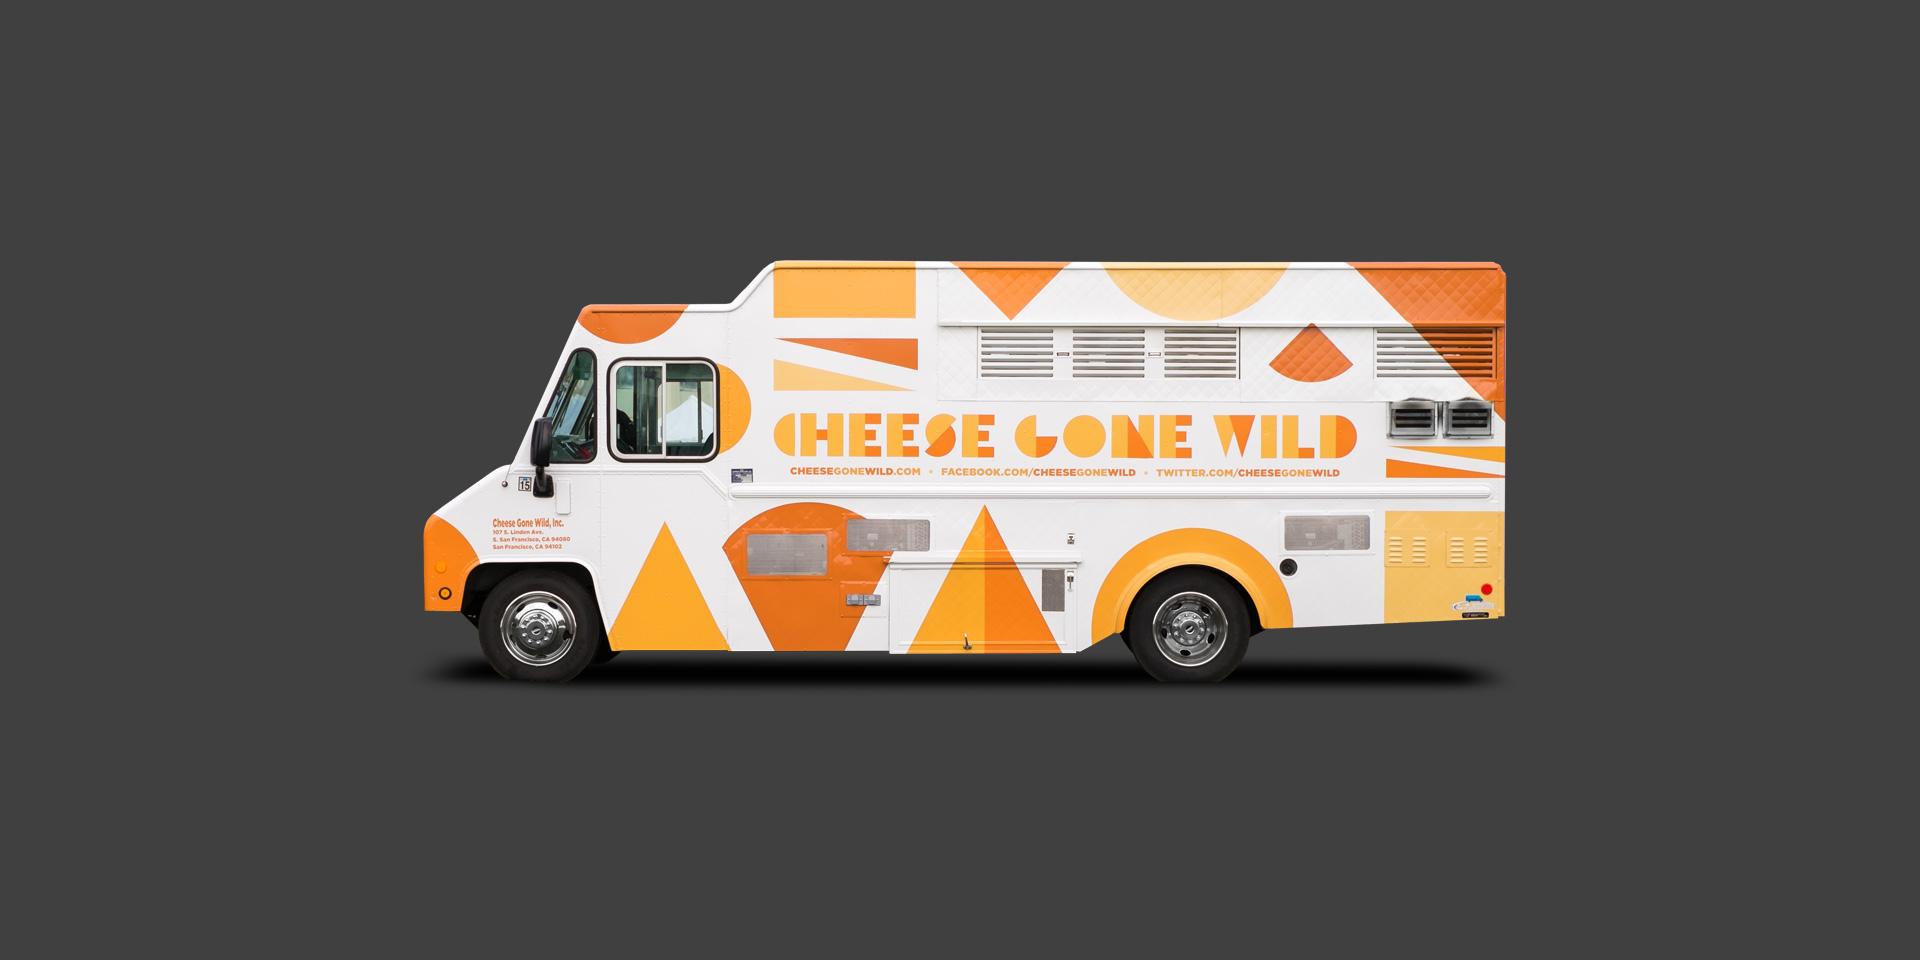 Cheese gone wild food truck adam j aaron advertising for Design your food truck